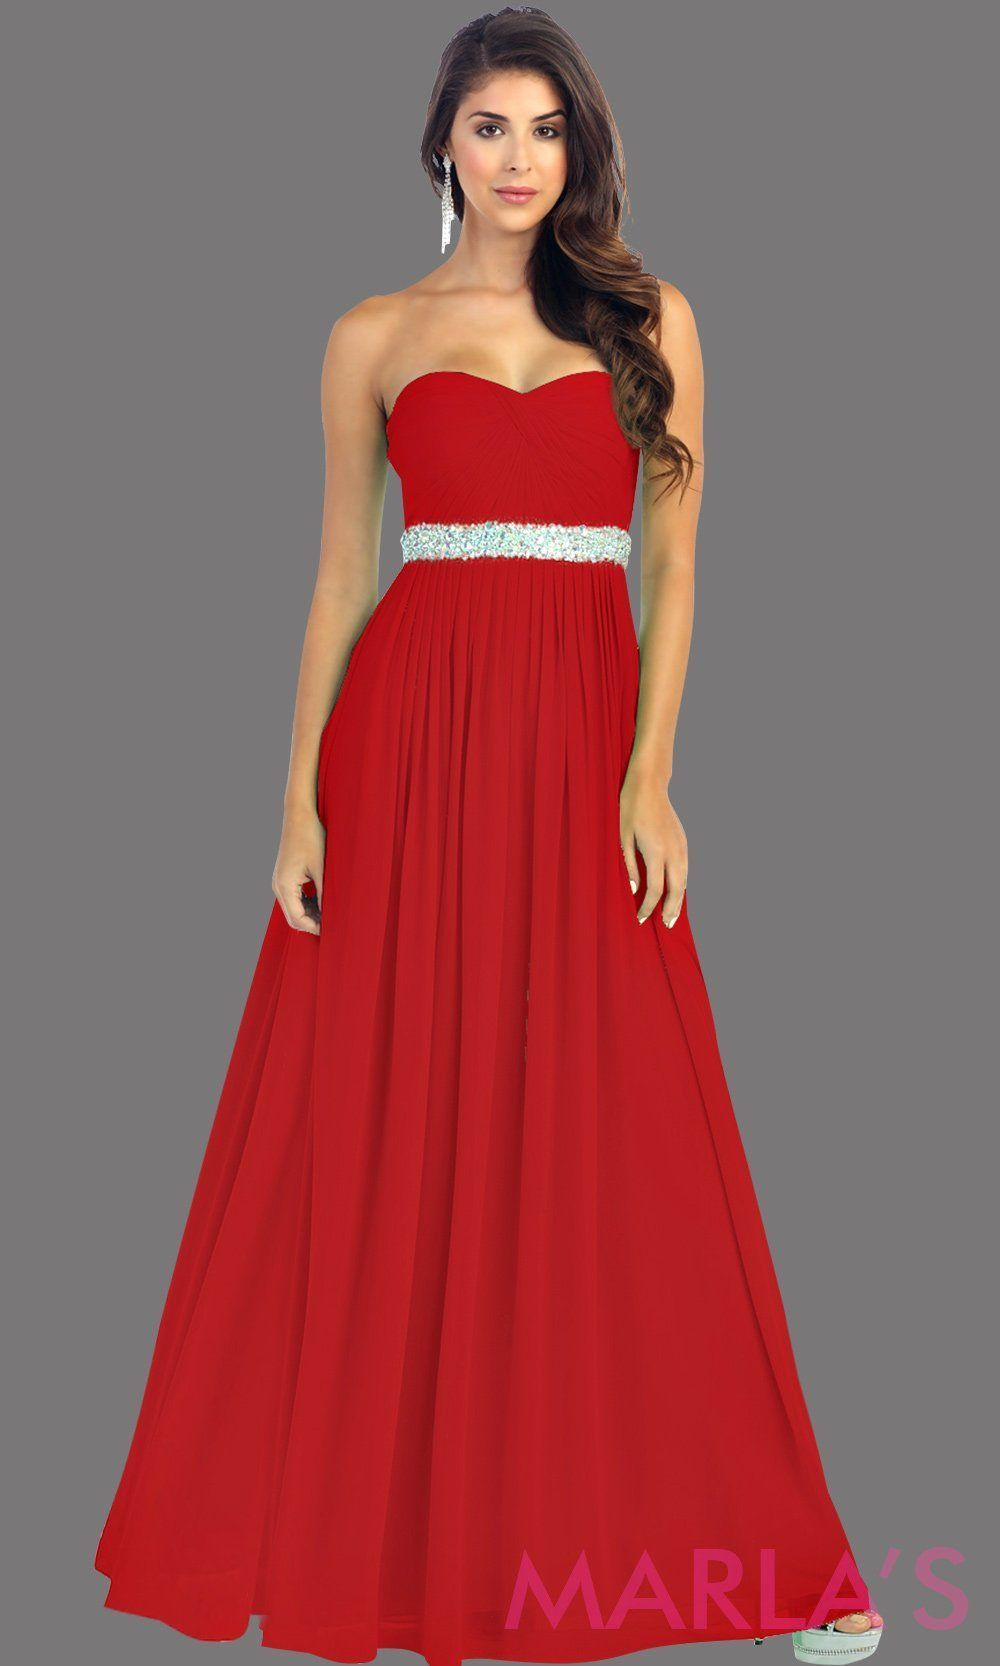 e8df1d0941 Long Red flowy dress with corset back. It has a multicolor ...